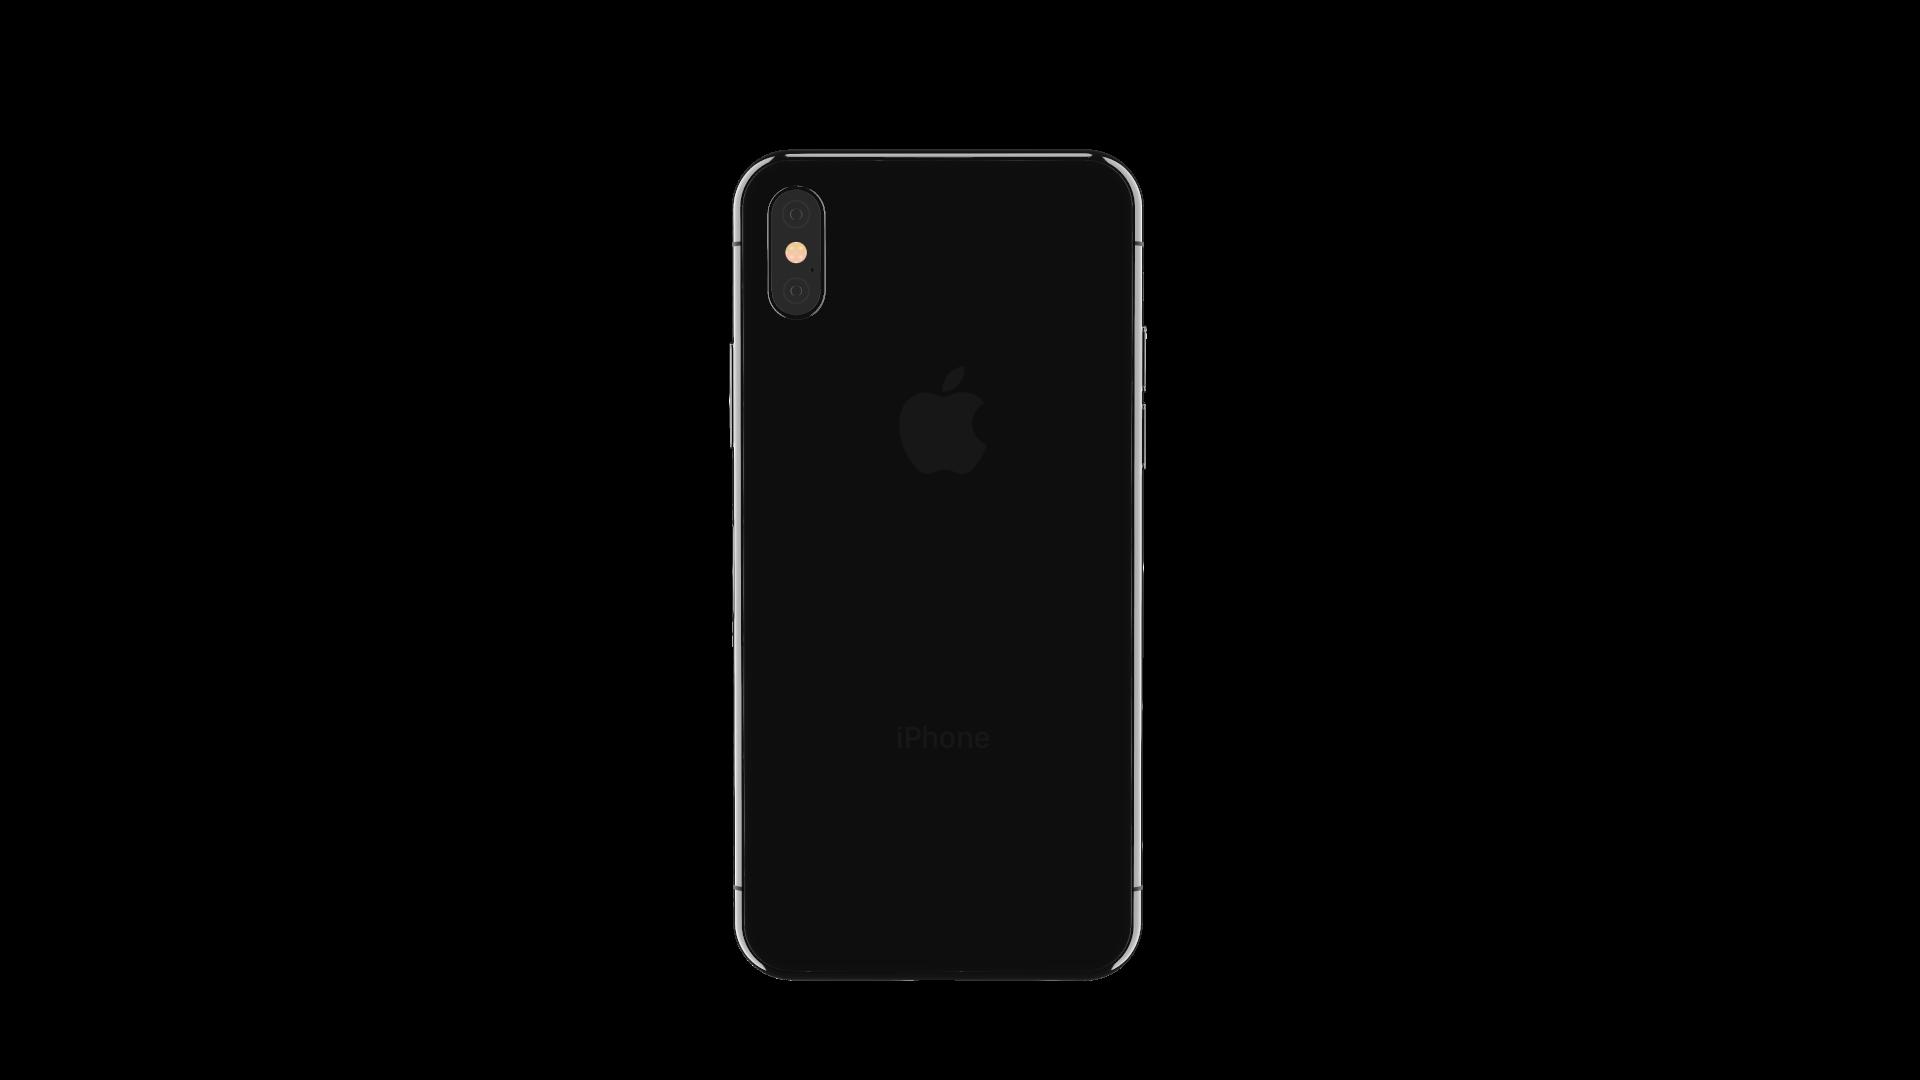 Element 3d Apple Iphone X Iphone Apple Iphone Hd Textures